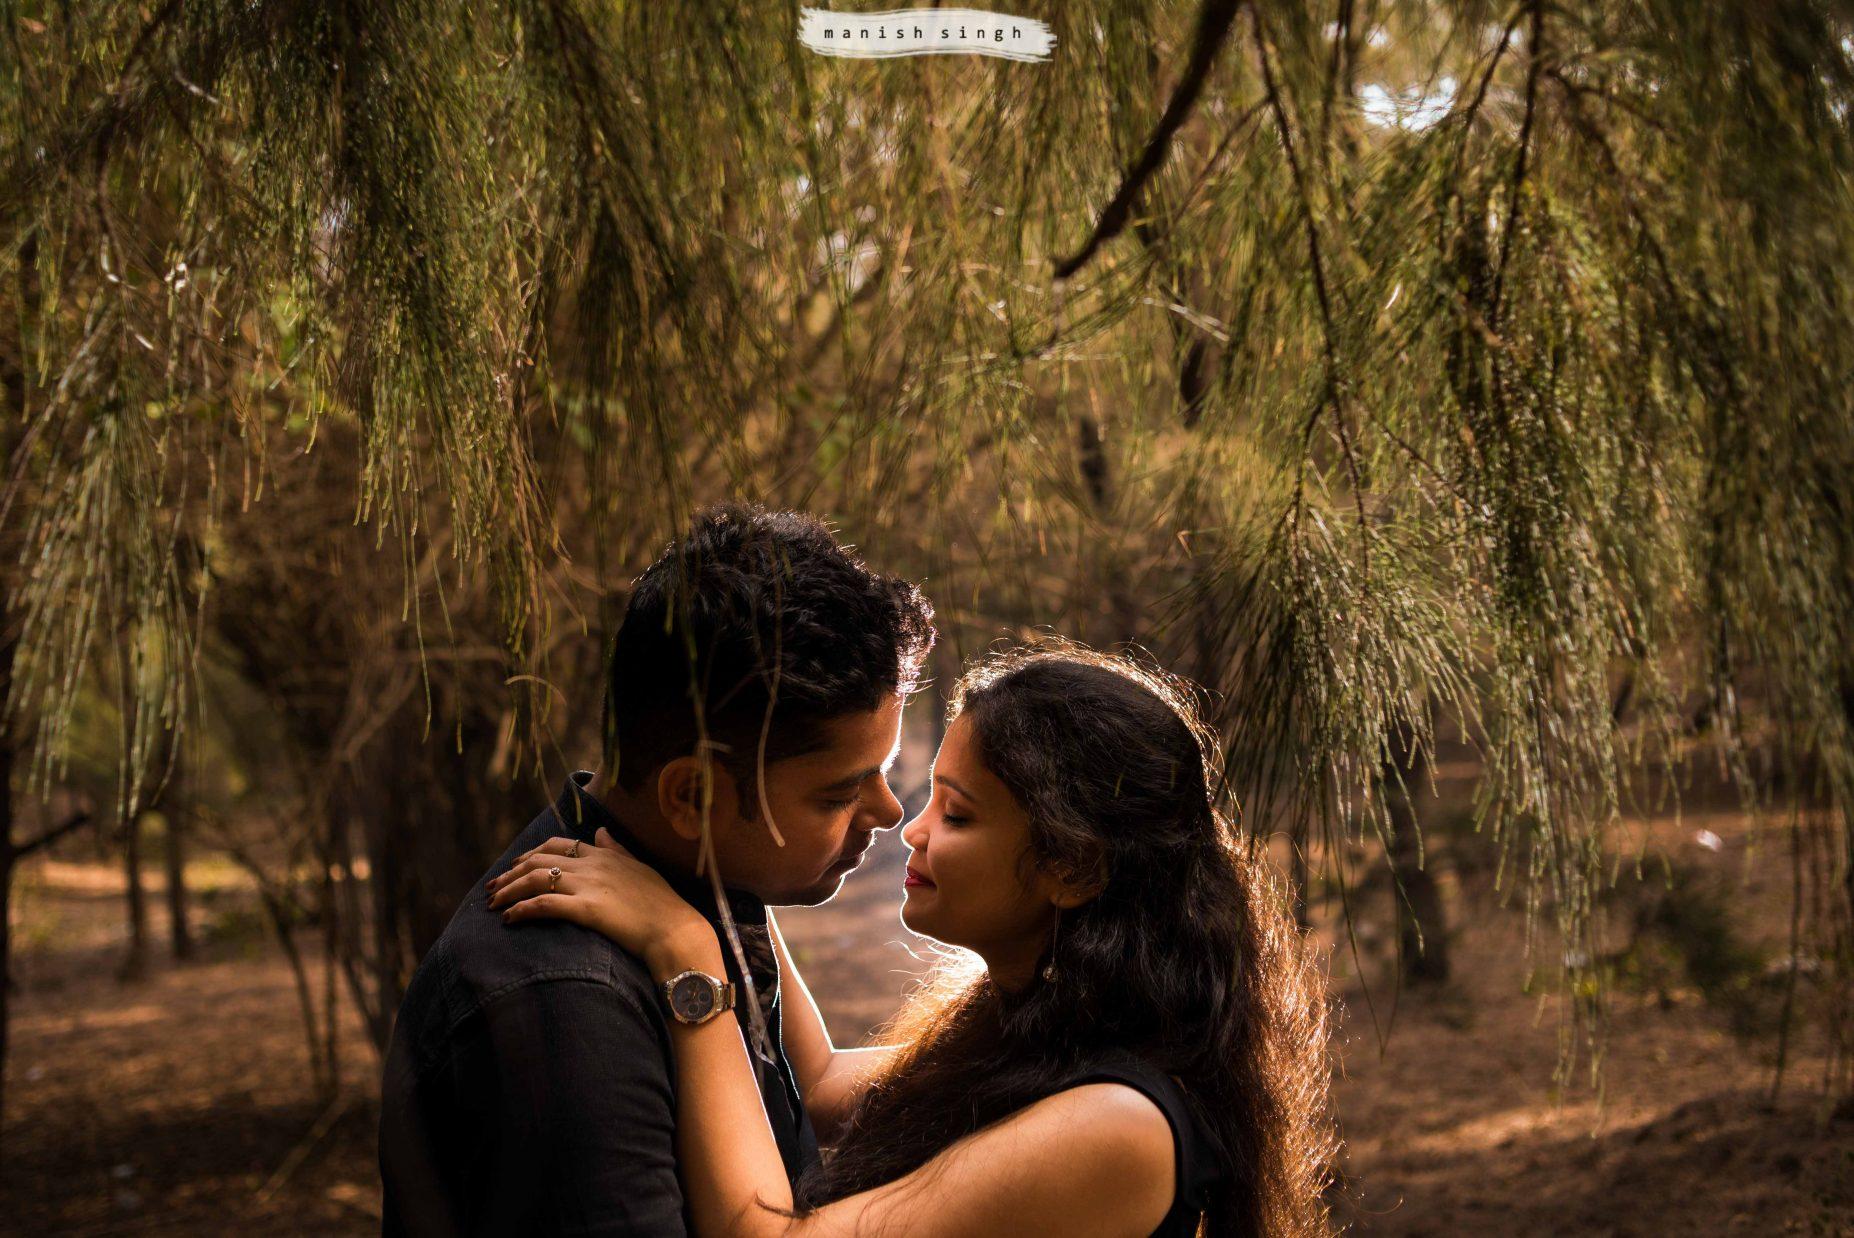 _Manish Singh Photography best wedding photographer bhubaneswar_-15